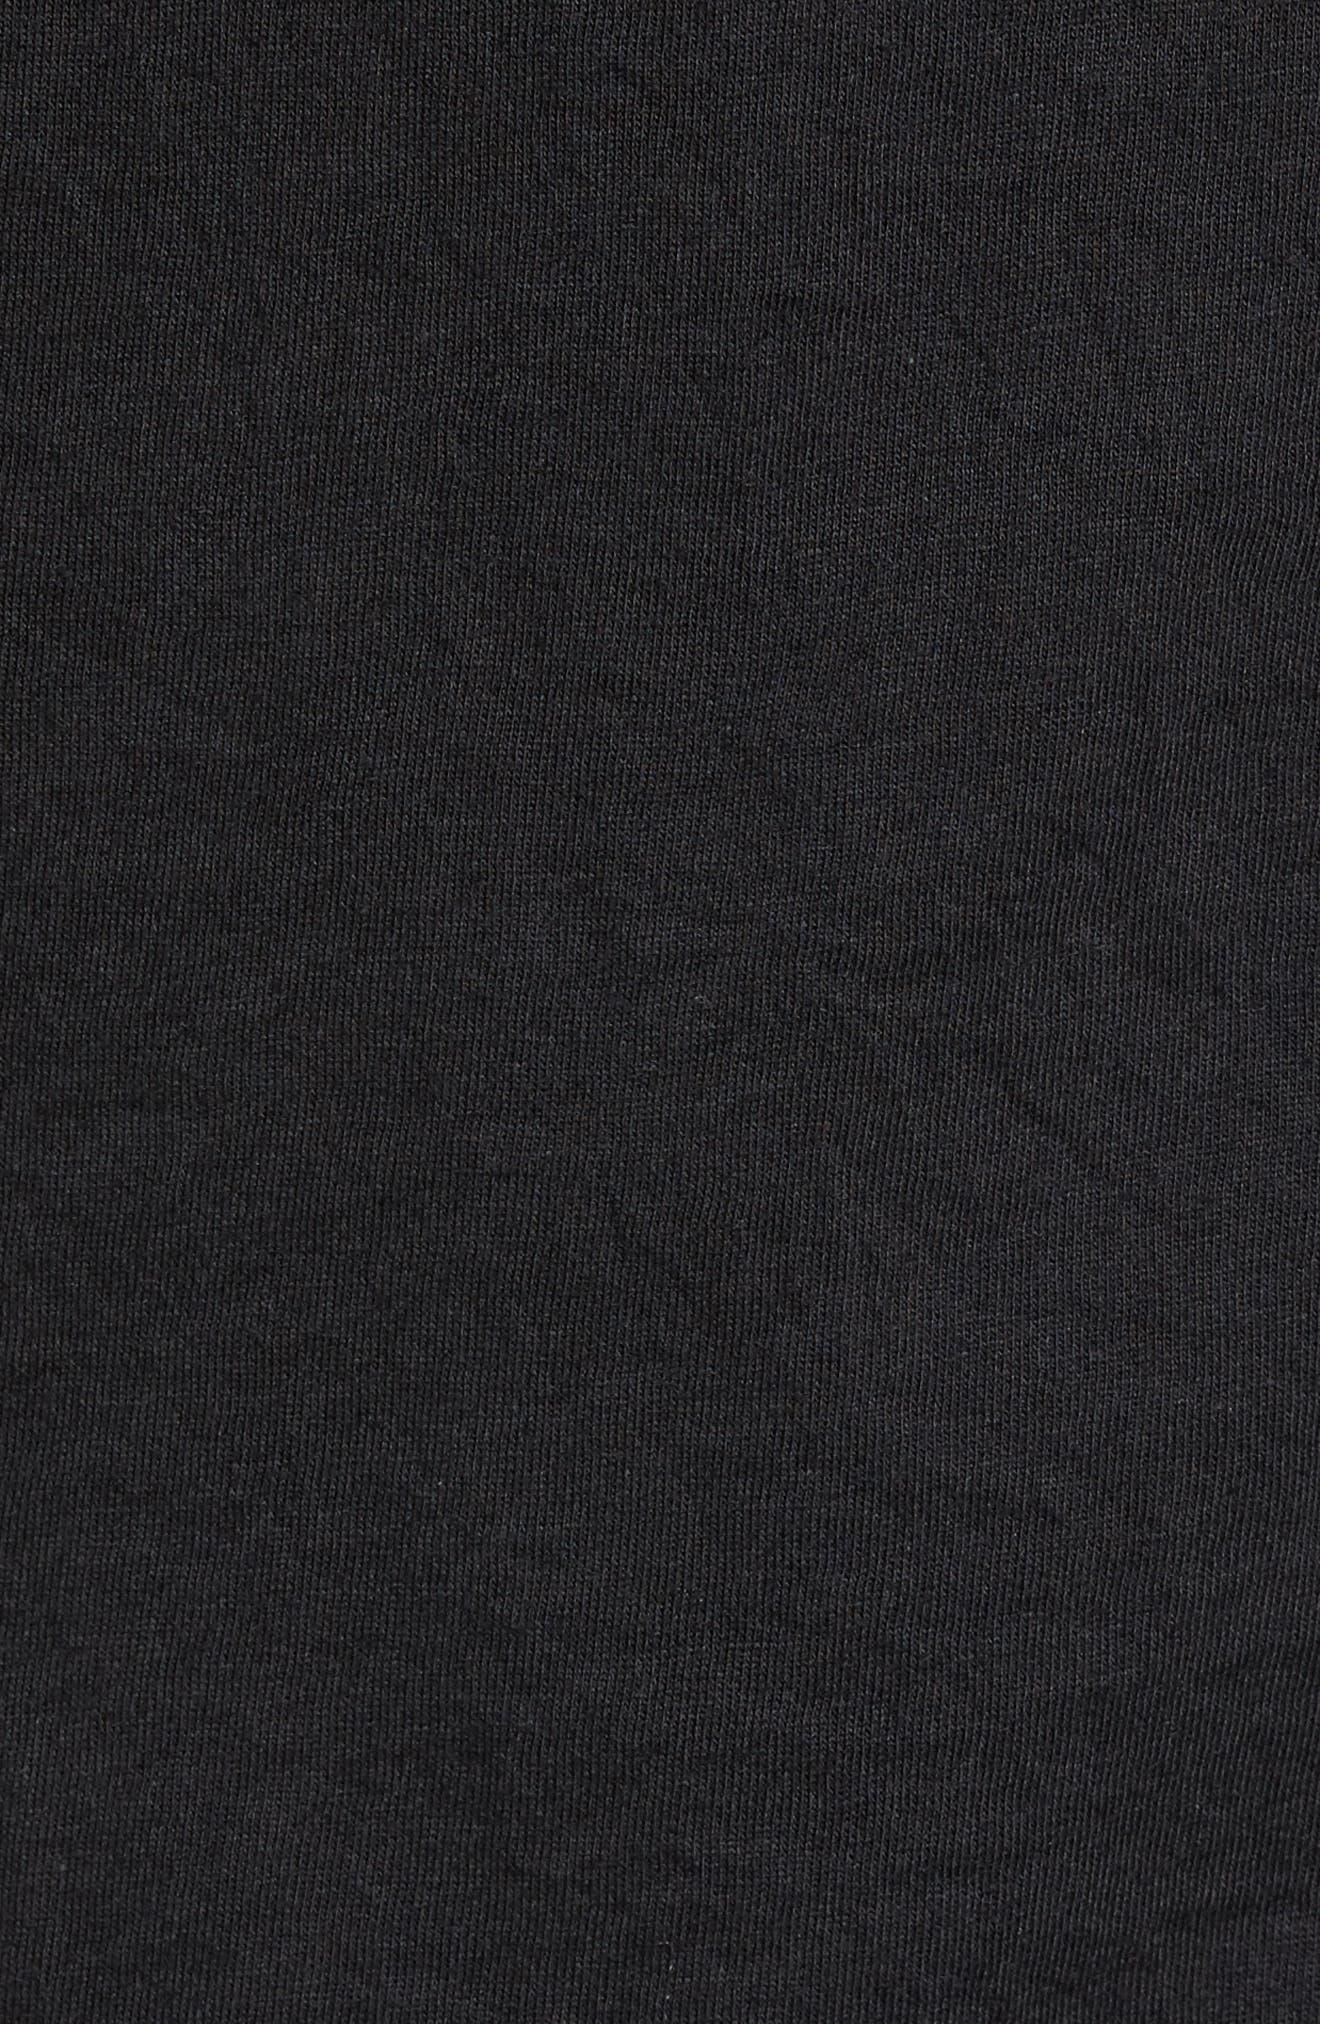 Waver Graphic T-Shirt,                             Alternate thumbnail 5, color,                             001